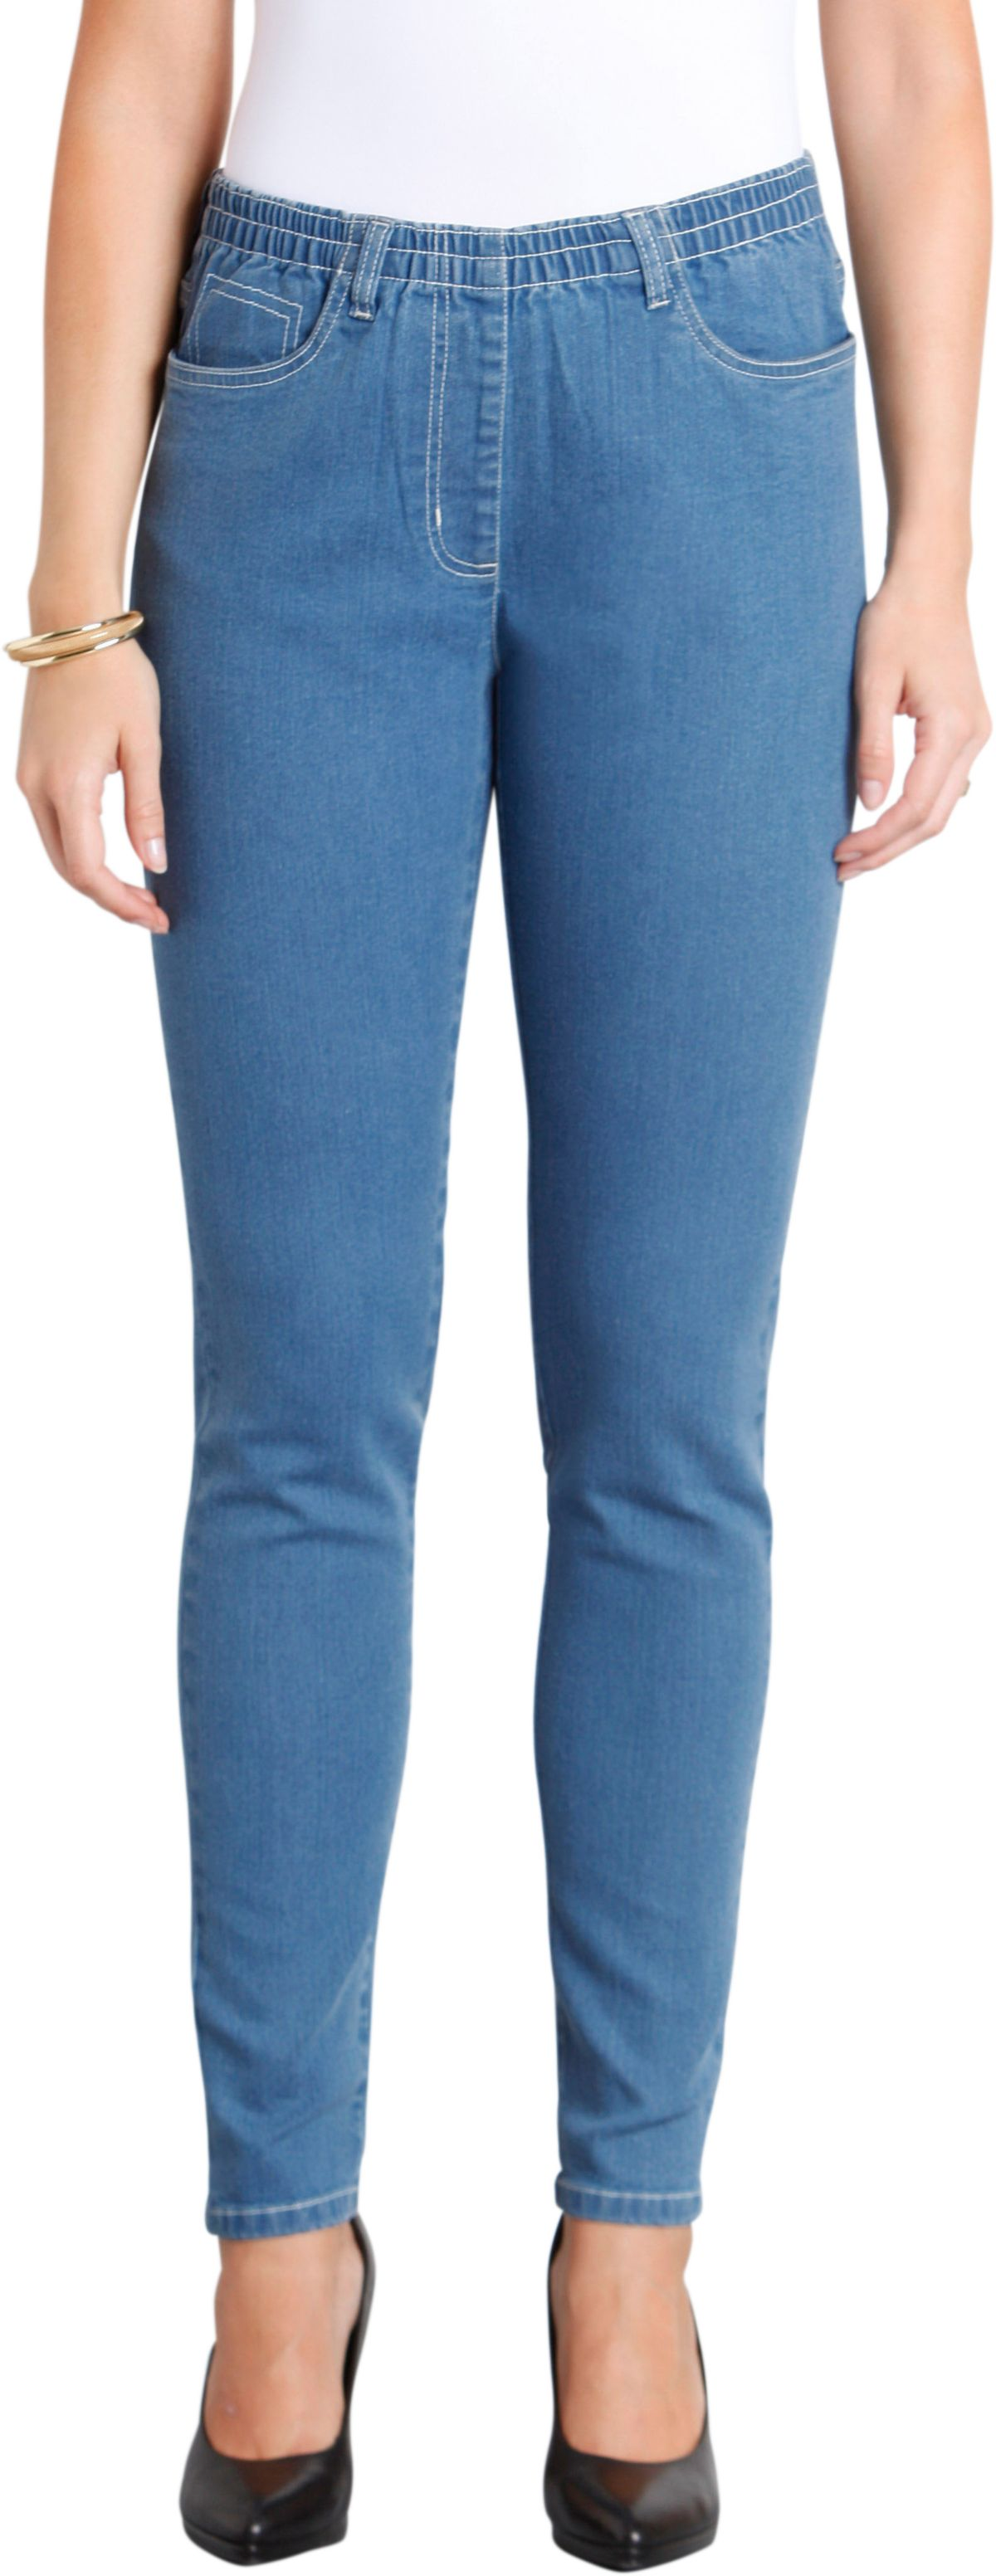 Classic Basics Jeans in bequemer Schlupfform